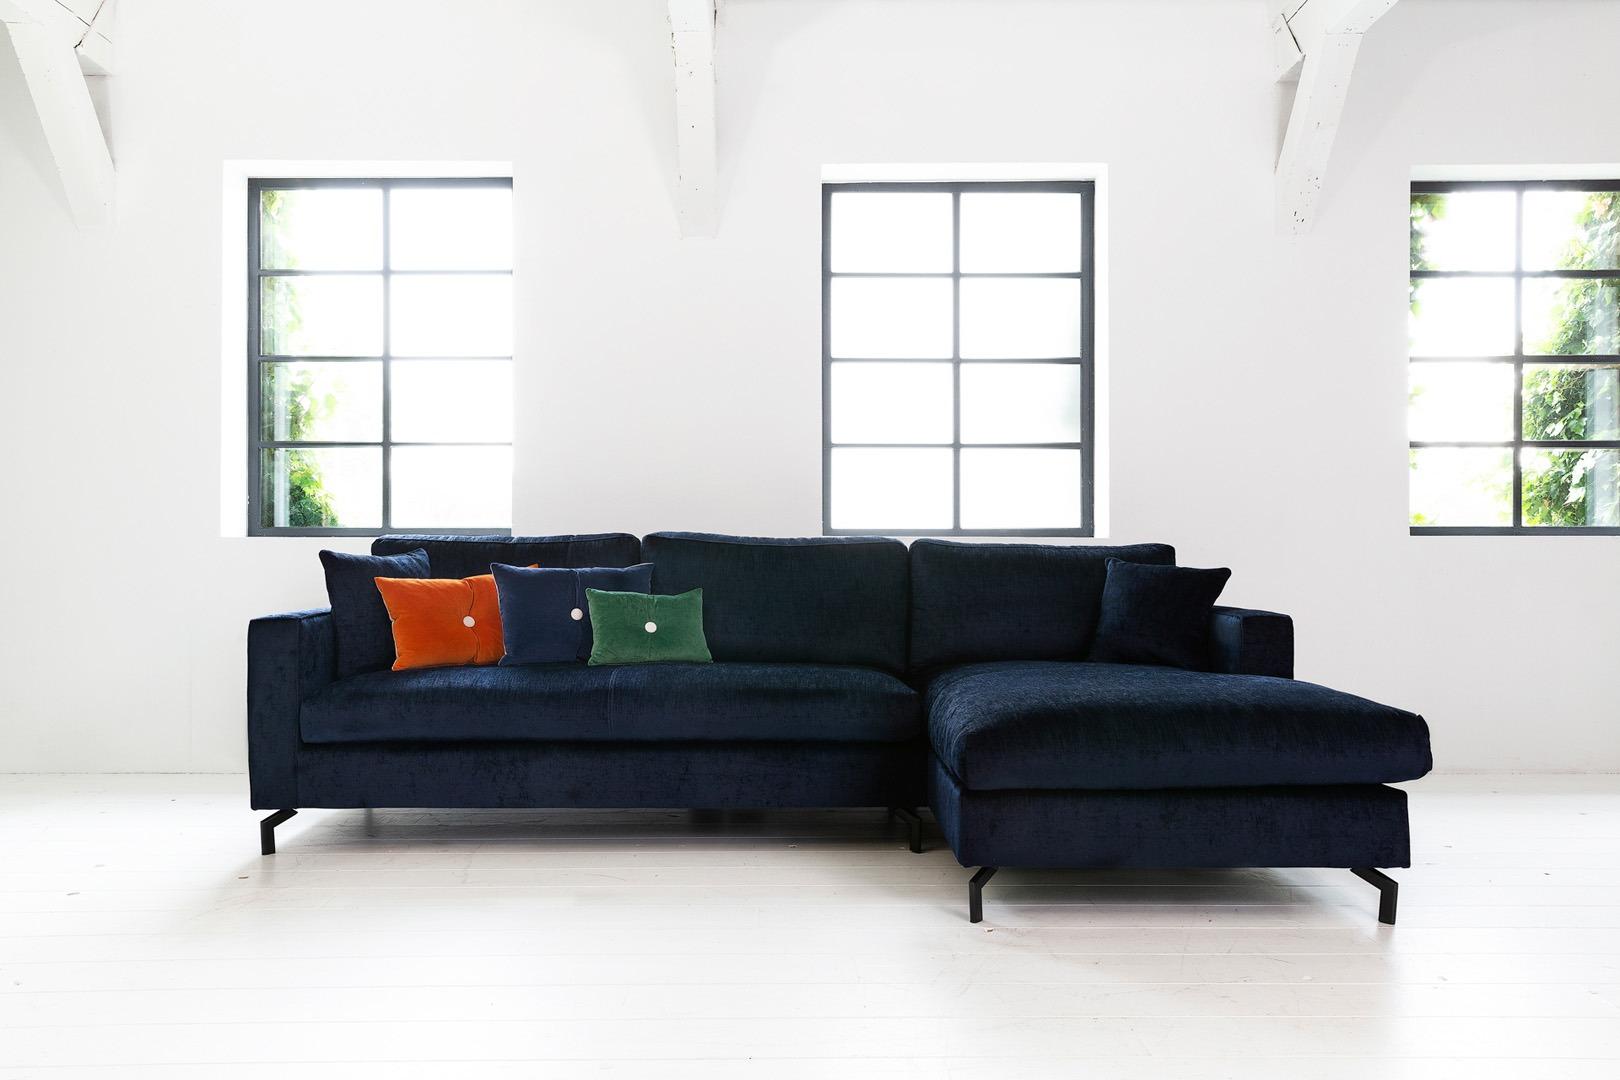 romantic-paris-hoekbank-ottoman-blauw-stof-soofs-interieur-